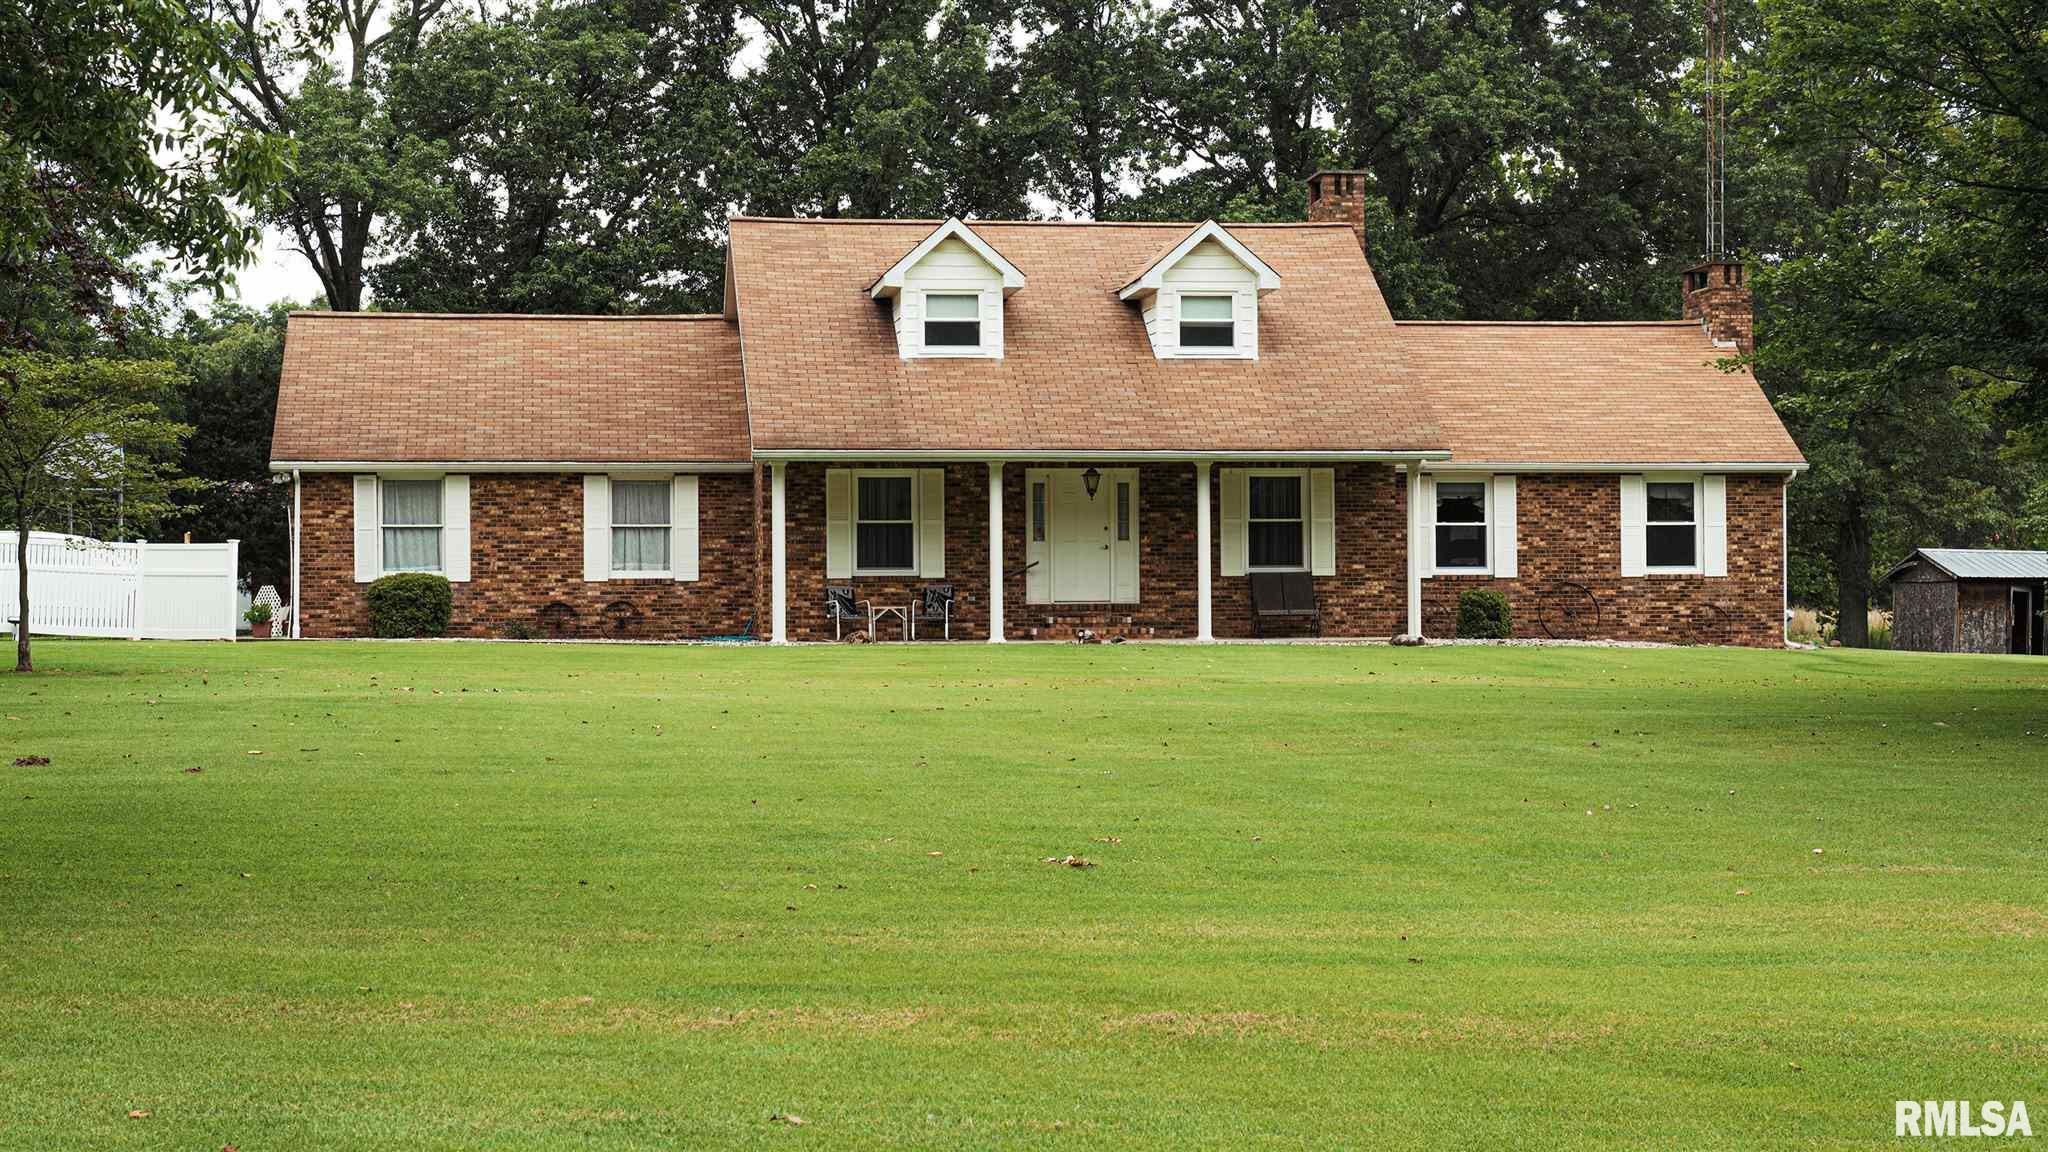 4505 HARRIS Property Photo - Salem, IL real estate listing